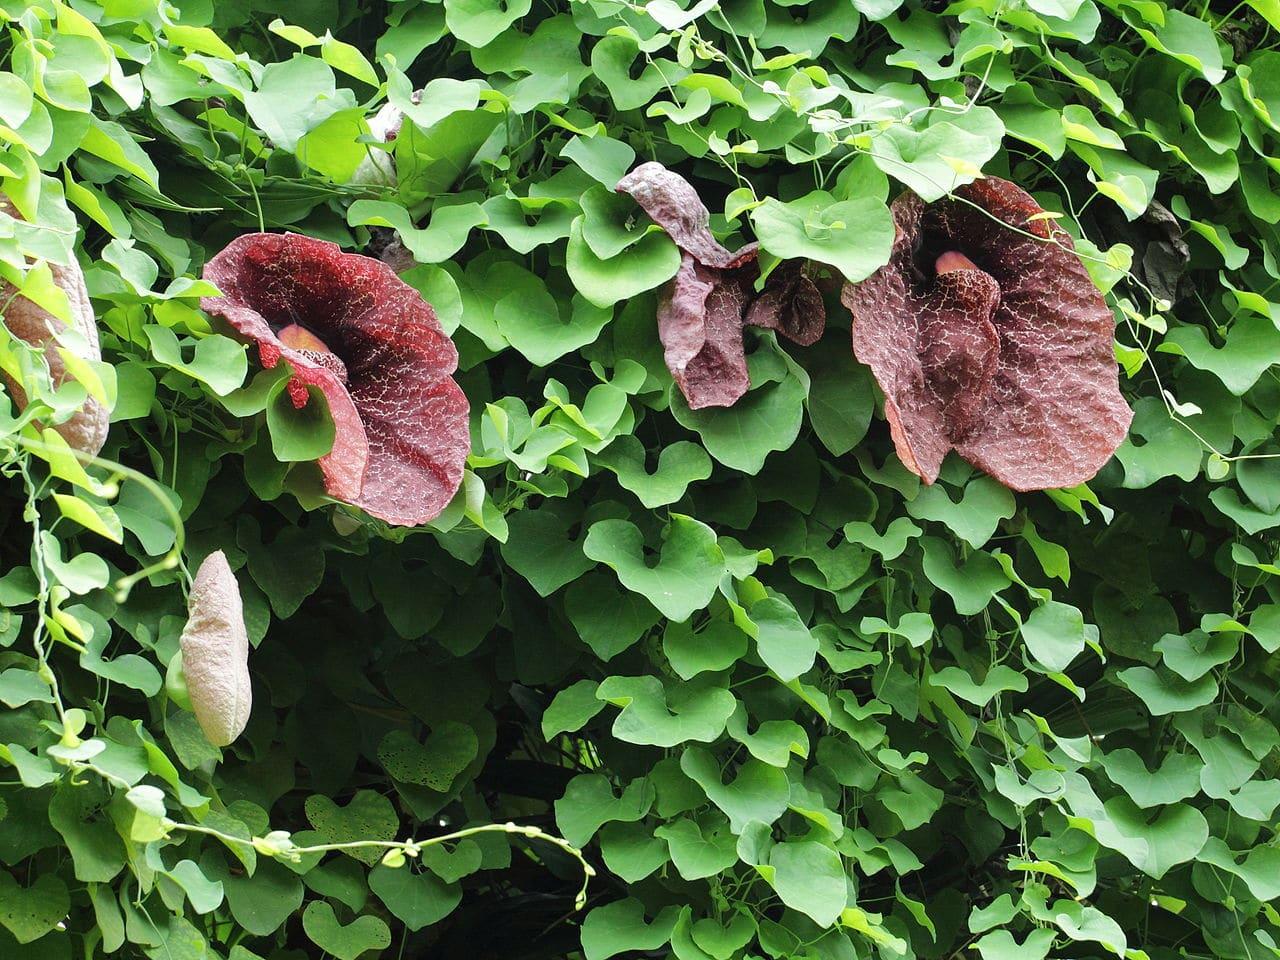 La Aristolochia es un género de plantas trepadoras